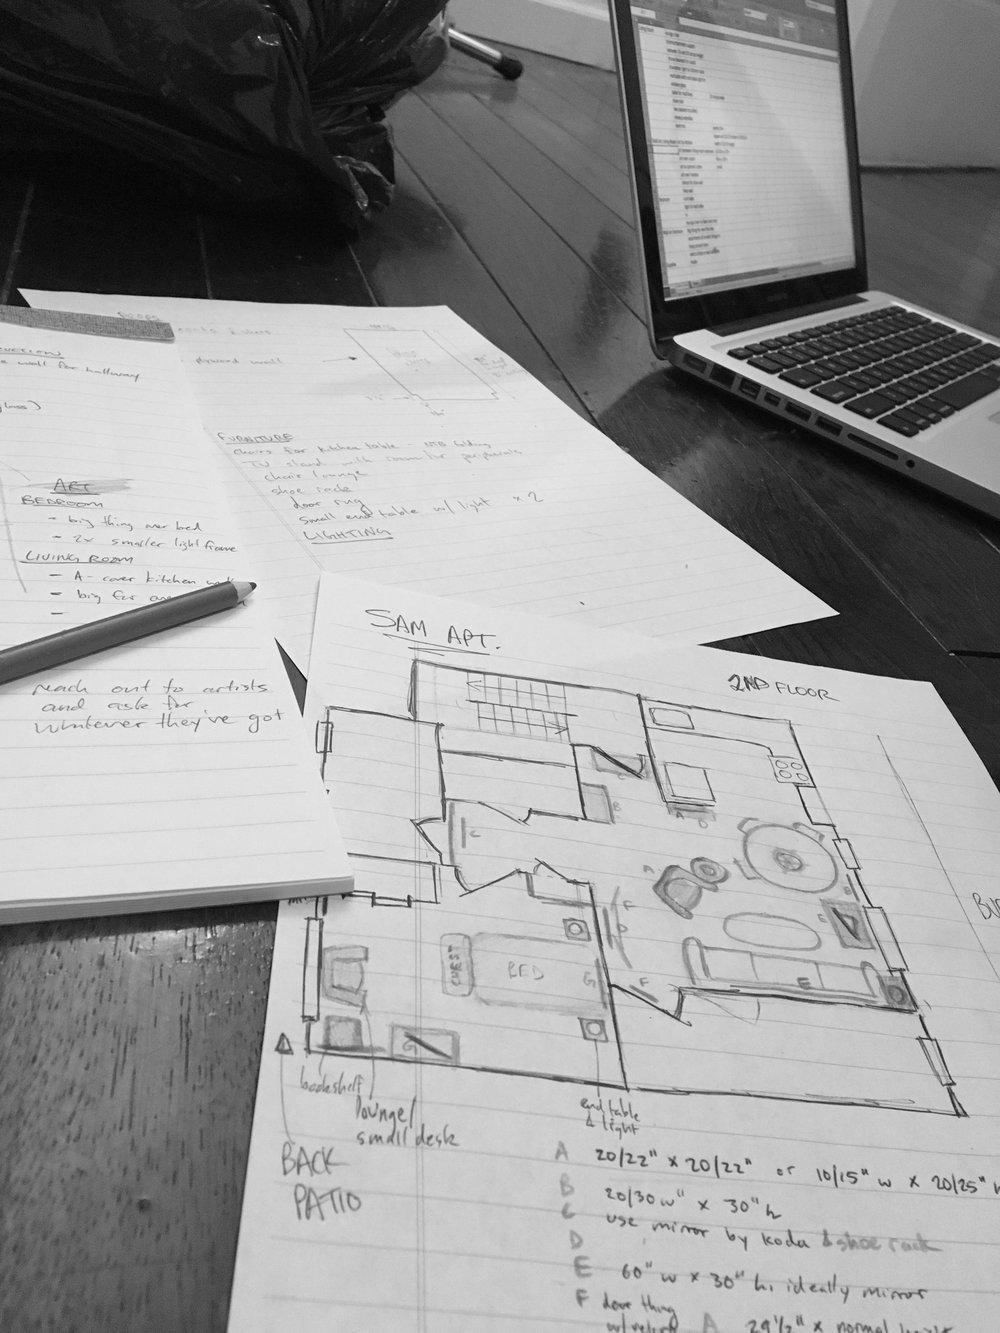 Furniture & art planning for Ellen's apartment.